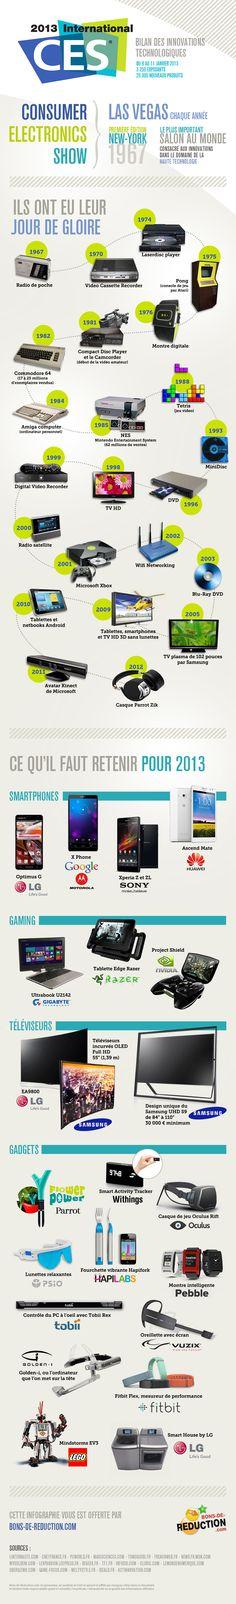 infographie_ces_20132